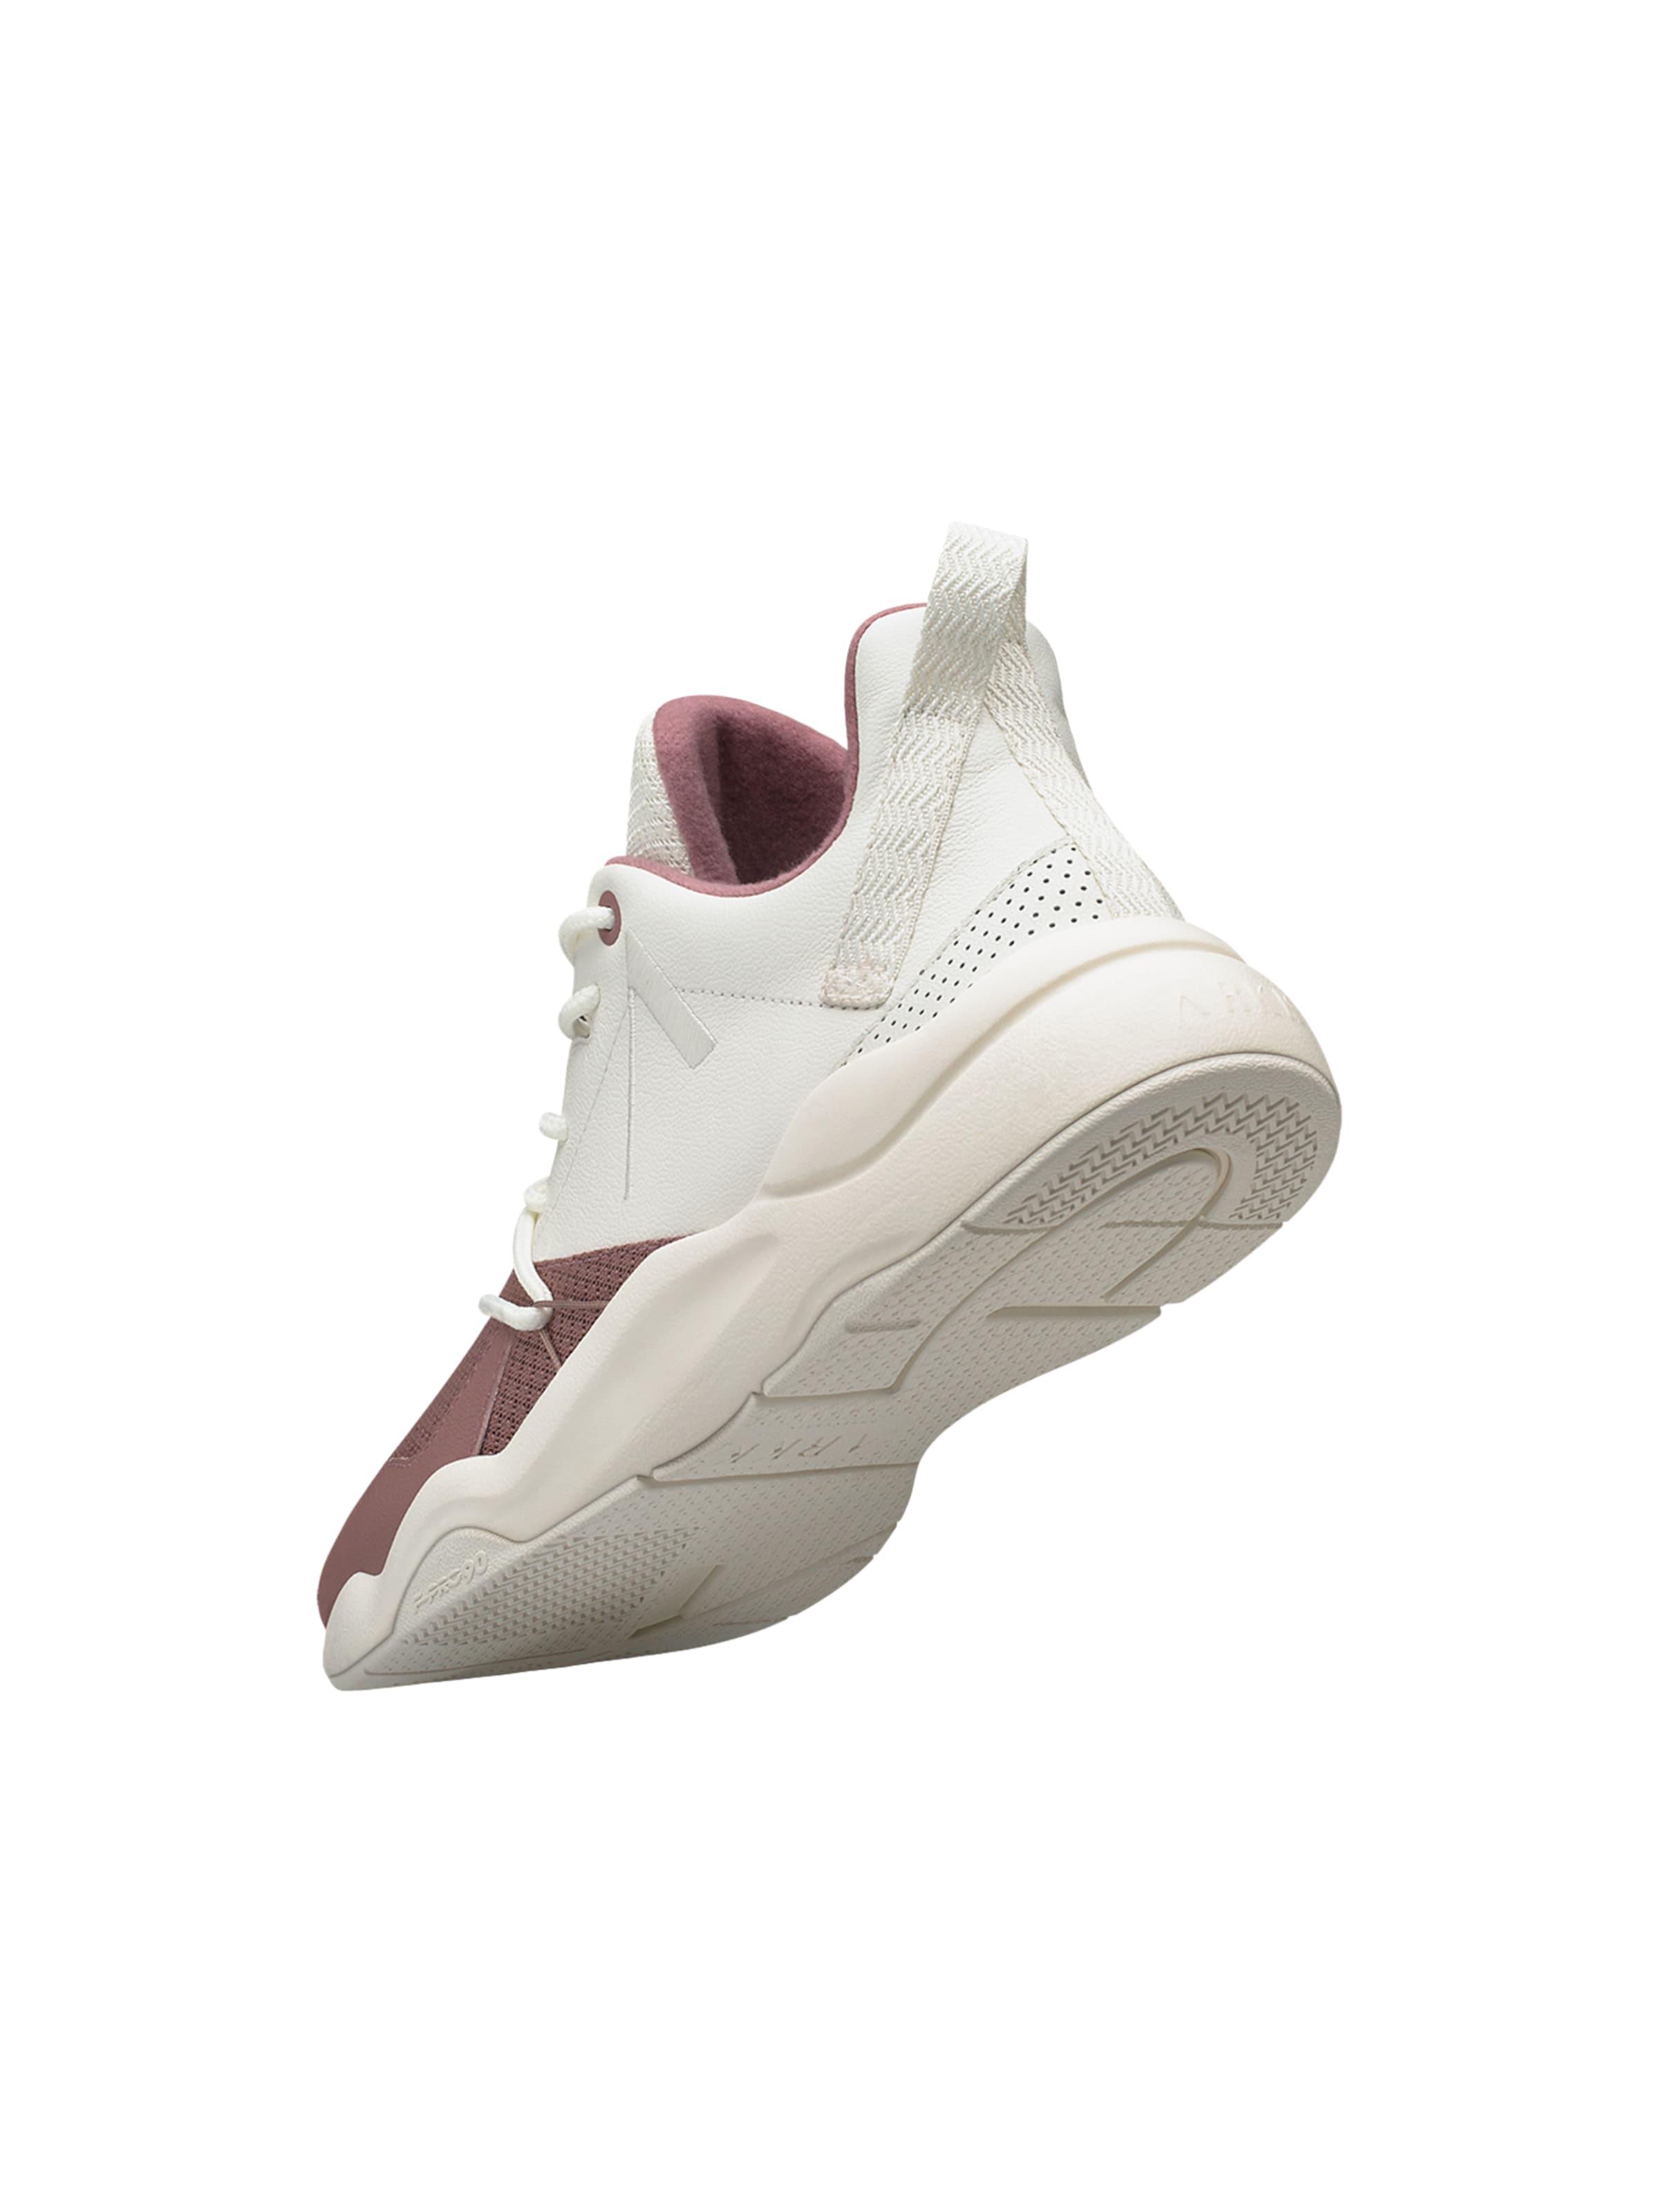 Sneaker F BordeauxOffwhite In Mesh Arkk pro90' Copenhagen 'asymtrix LMGzqUSVp